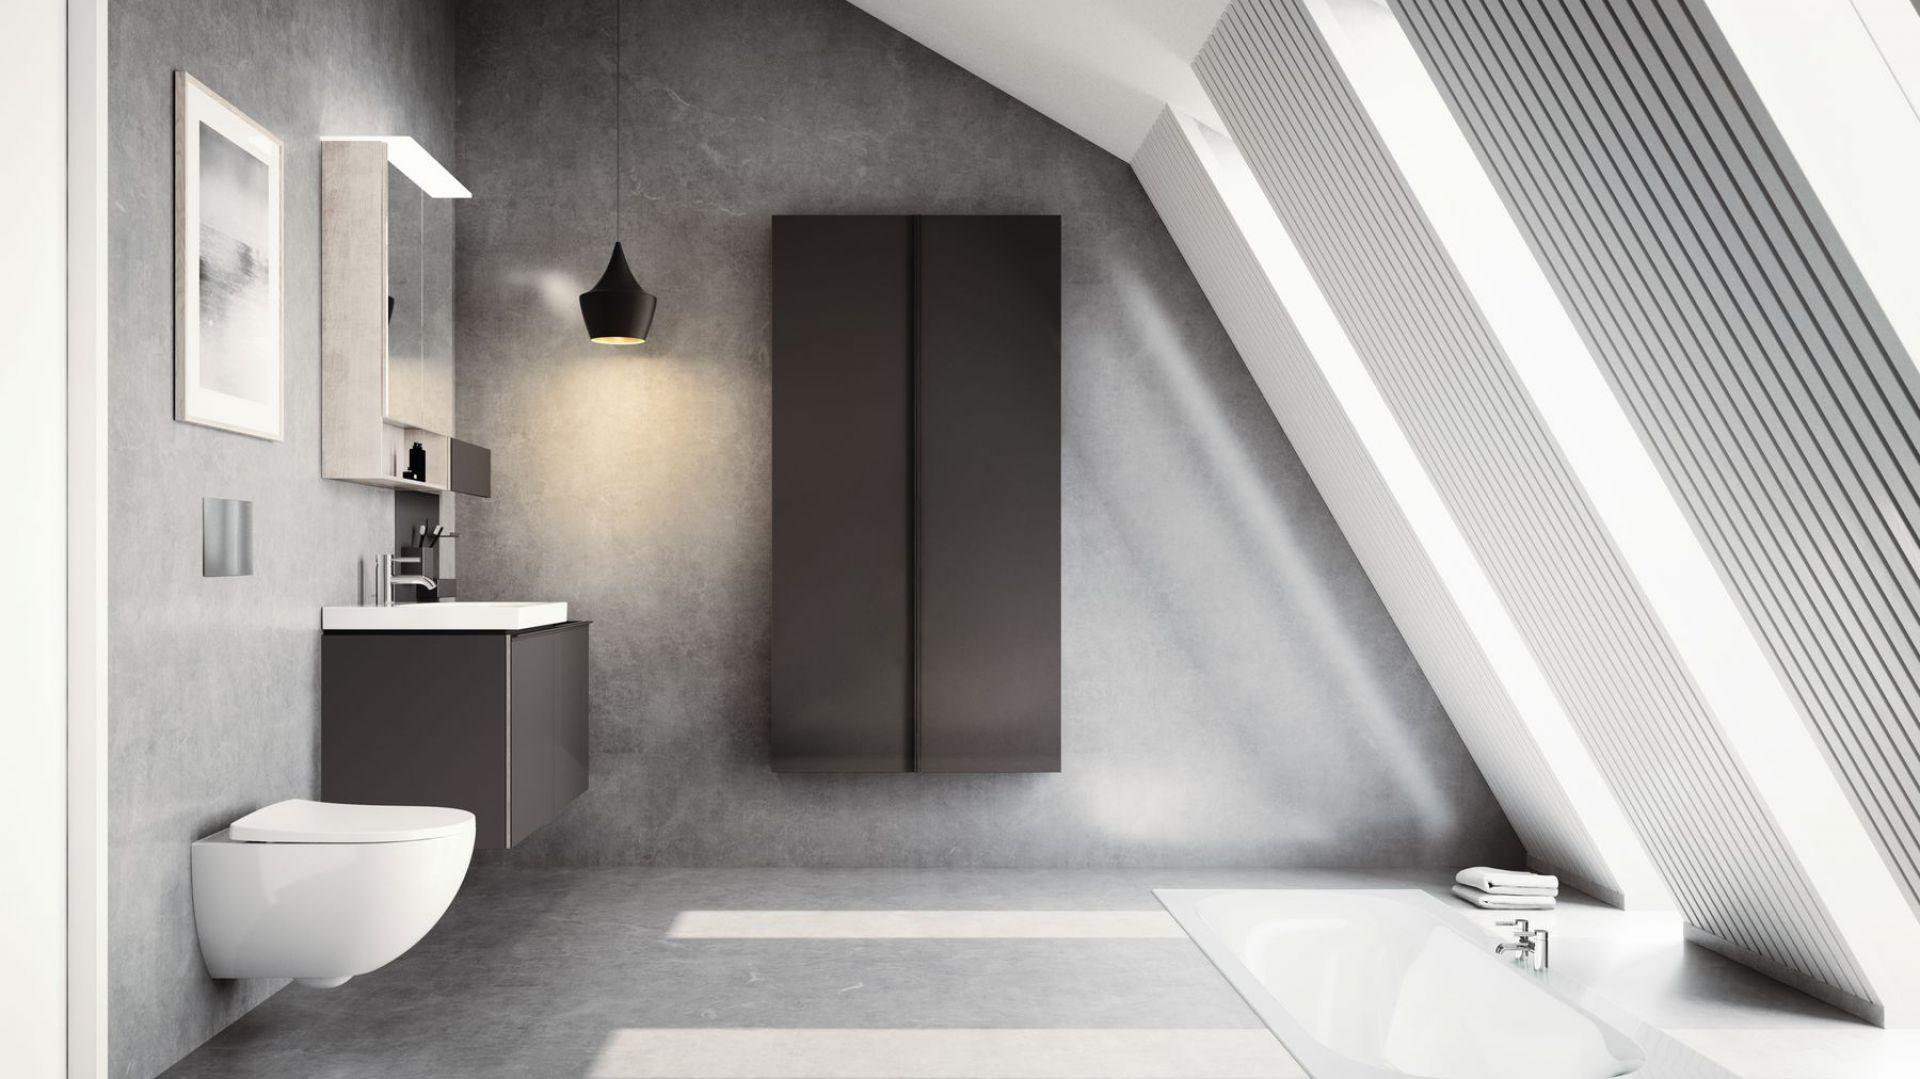 Ciemne meble łazienkowe z kolekcji Acanto marki Geberit. Fot. Geberit